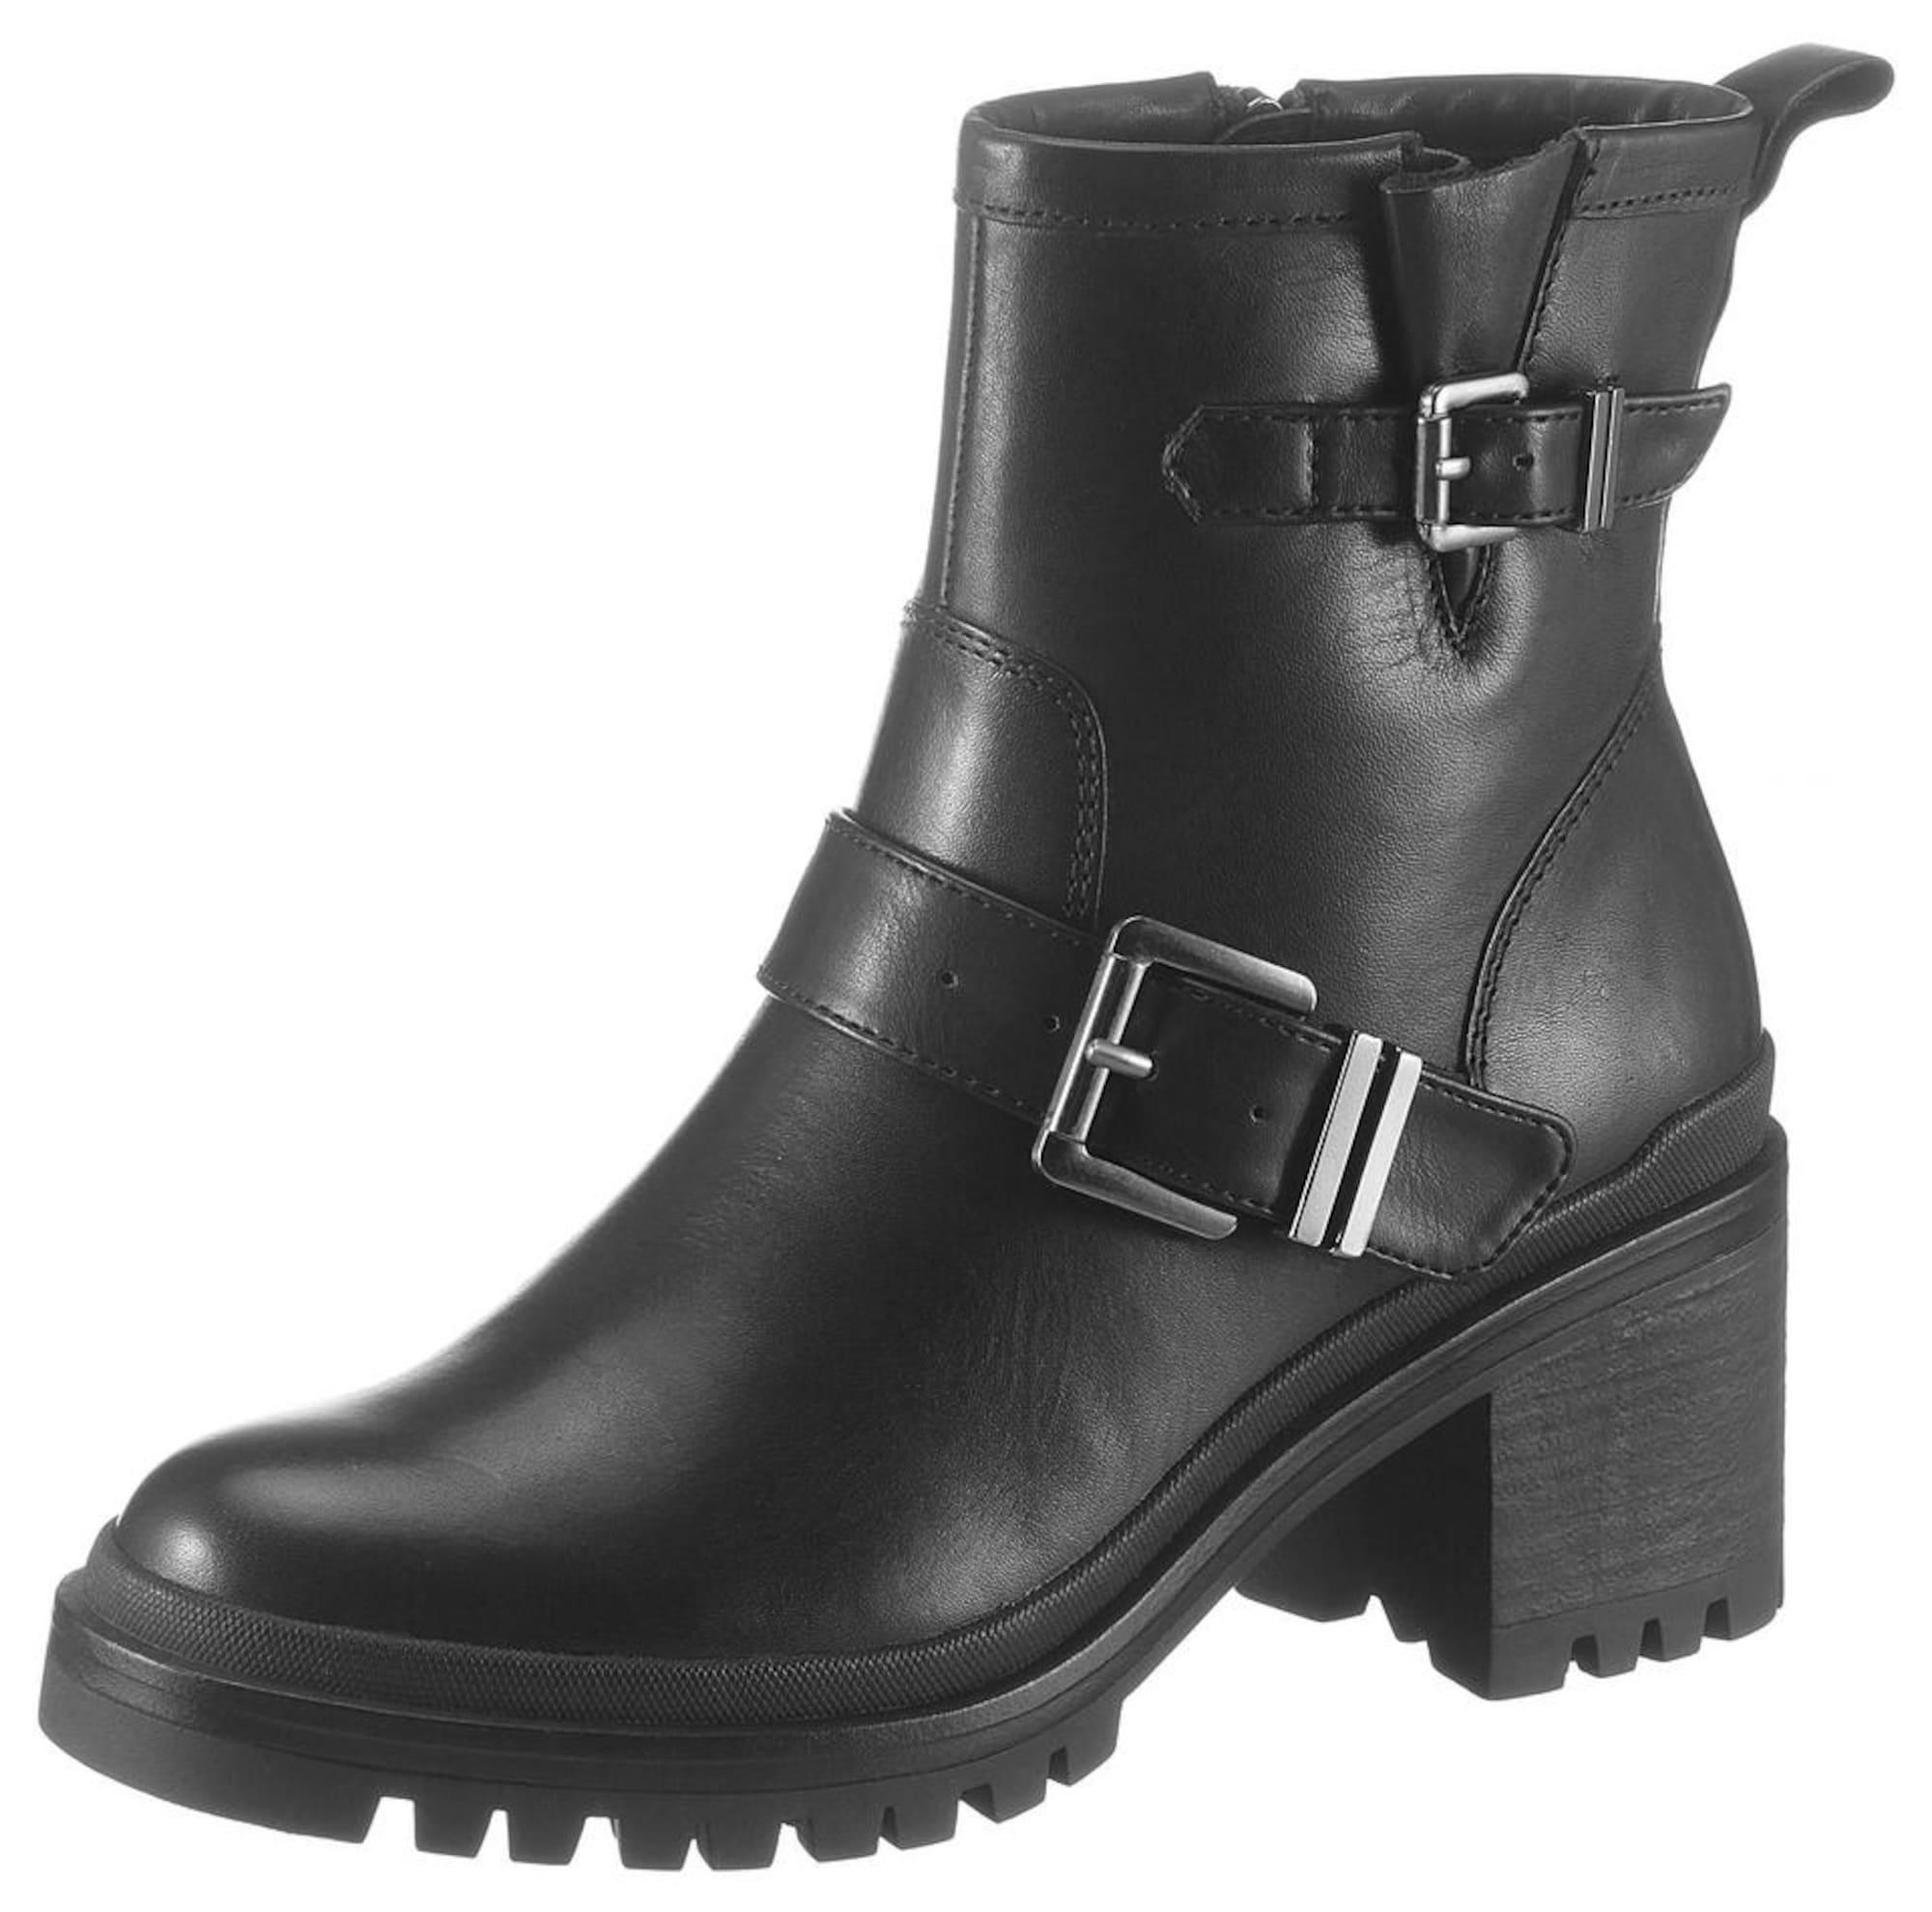 Bikerboots 'Marielle' | Schuhe > Boots > Bikerboots | tamaris